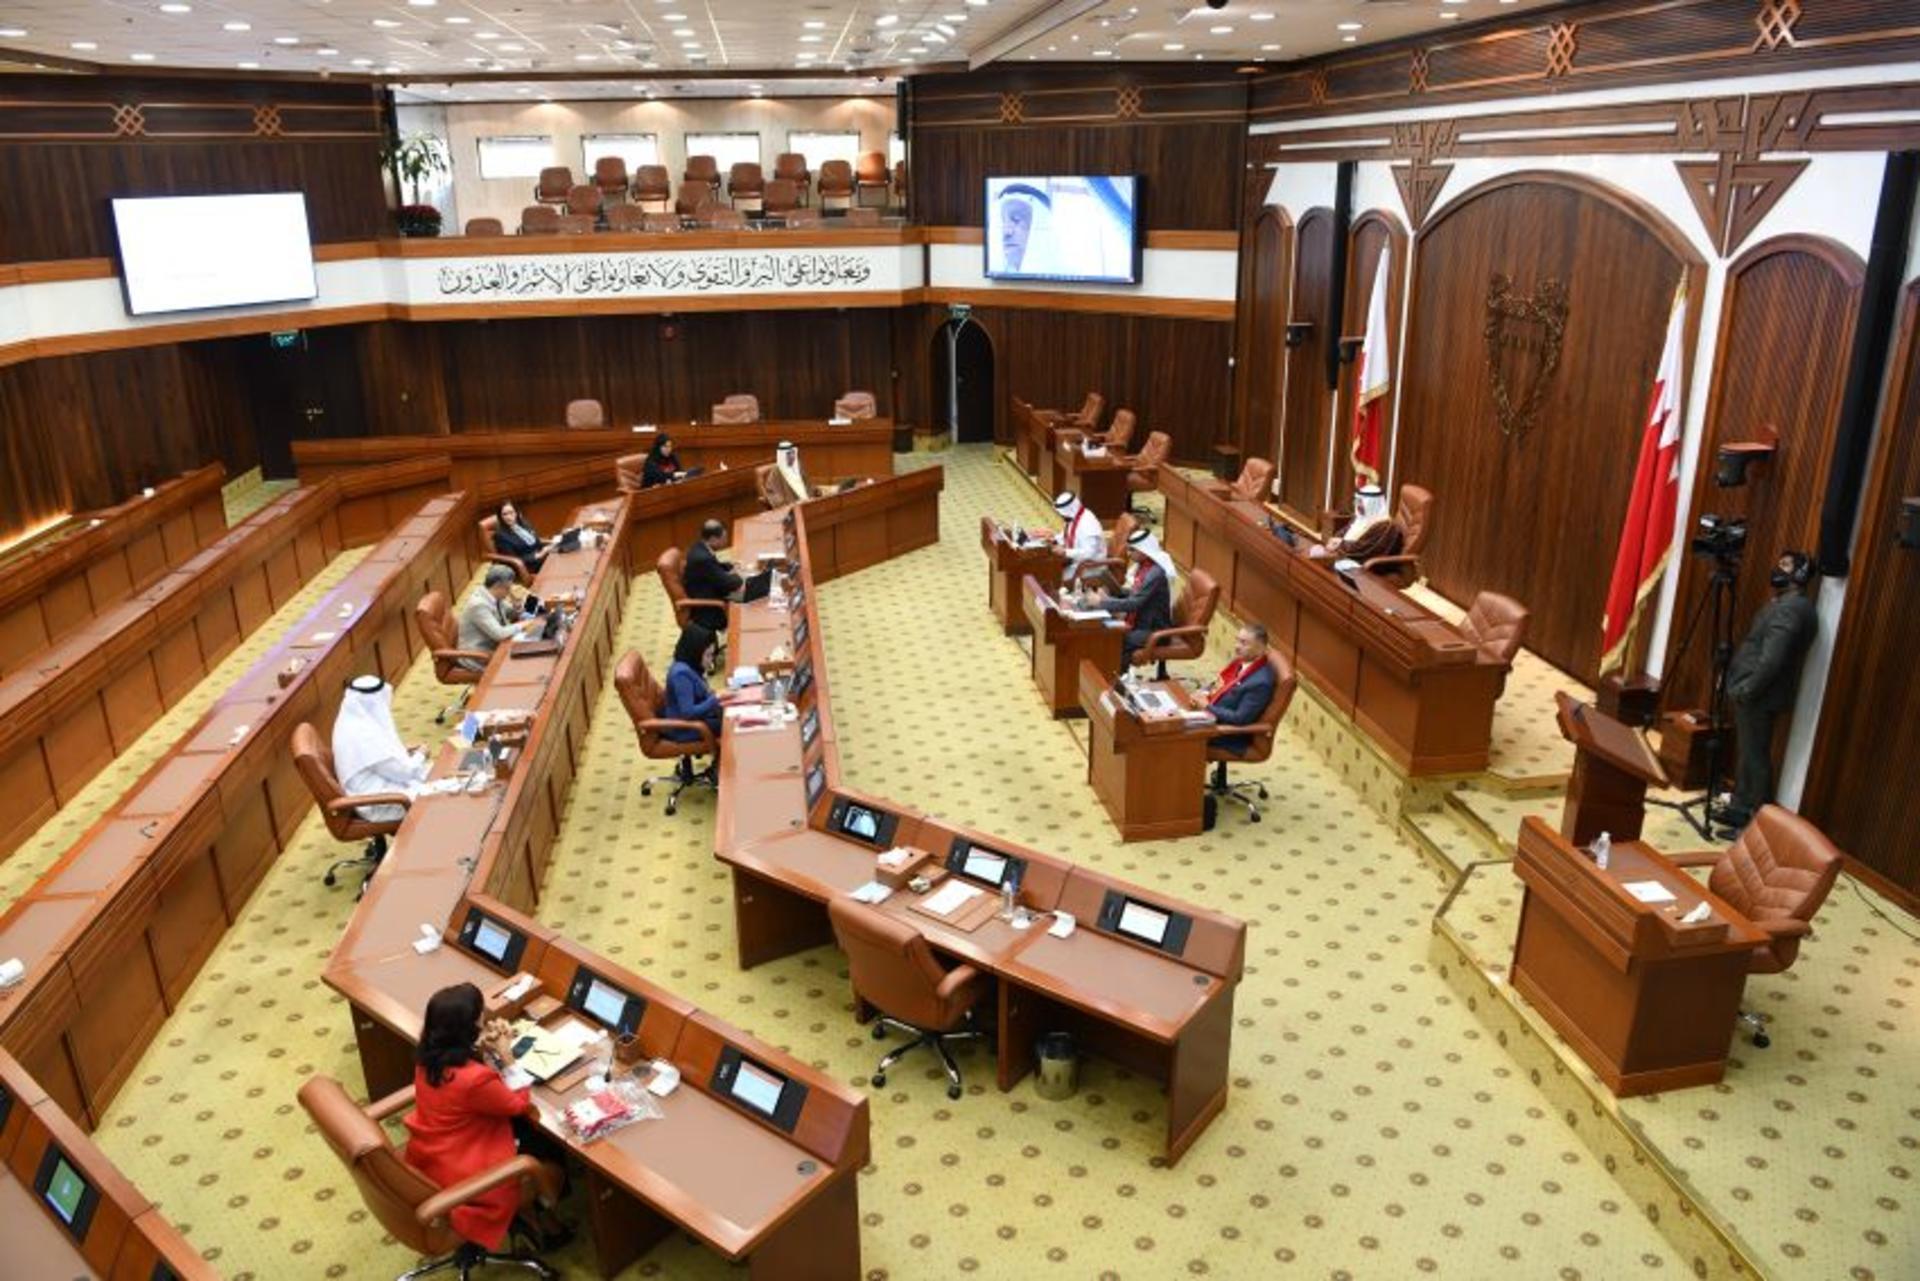 Bahrain's Shura Council takes precautionary measures during the COVID 19 pandemic